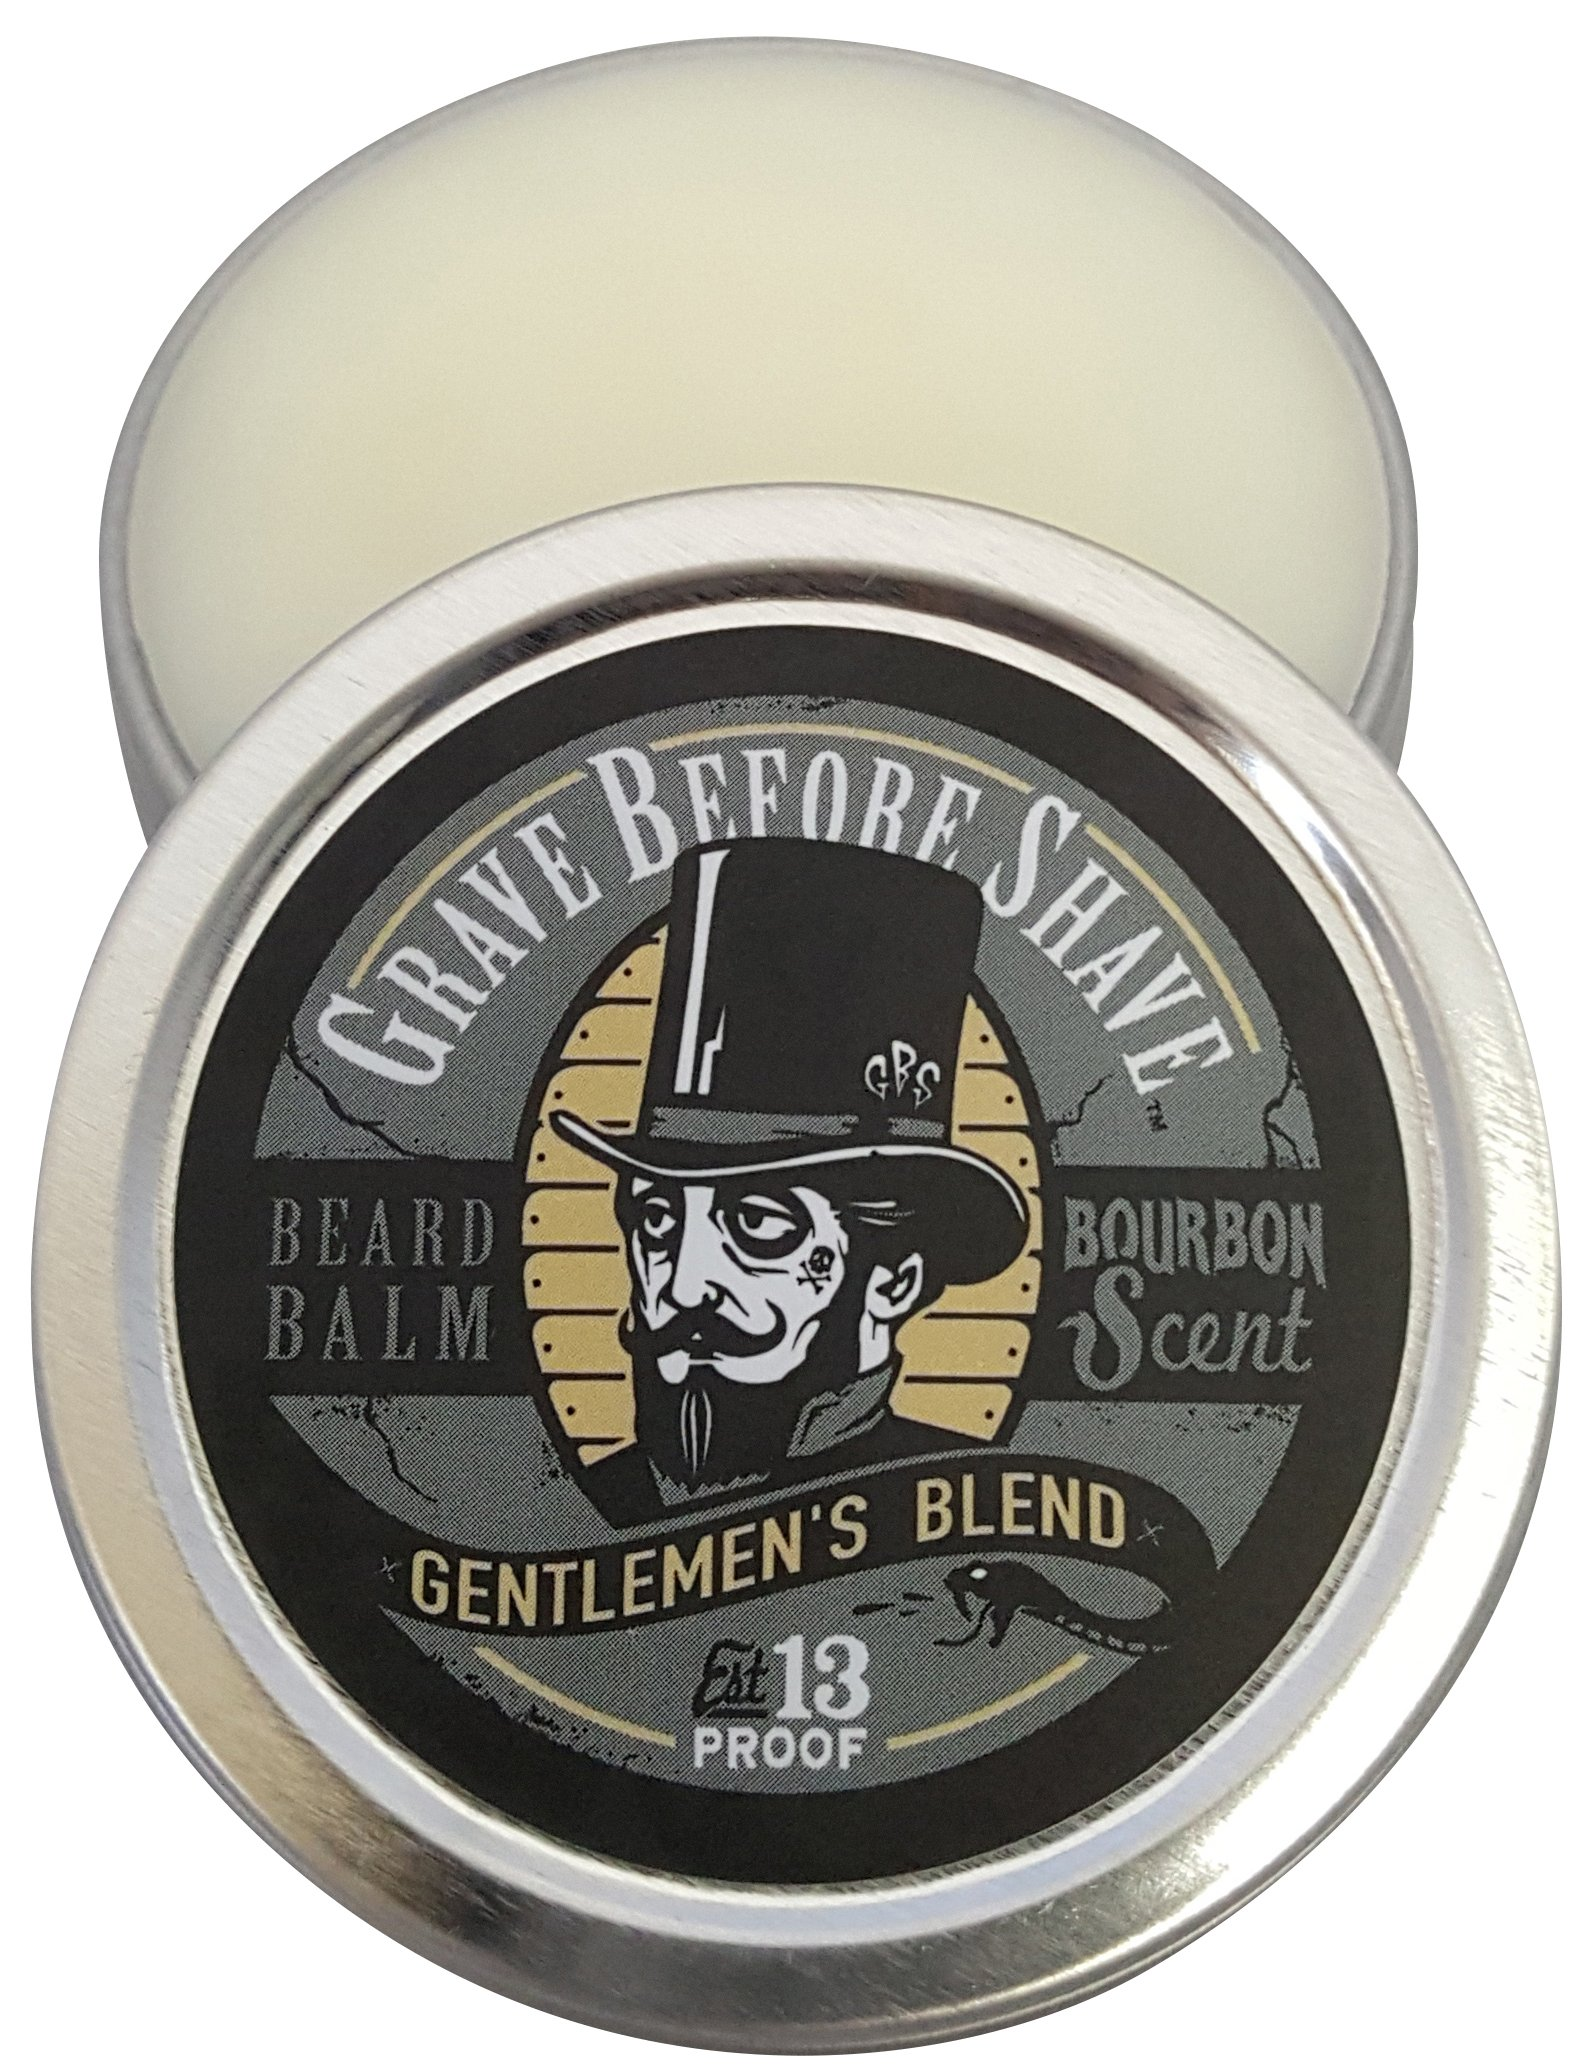 GRAVE BEFORE SHAVE Gentlemen's Blend Beard Balm (Bourbon Scent) (4 oz.)